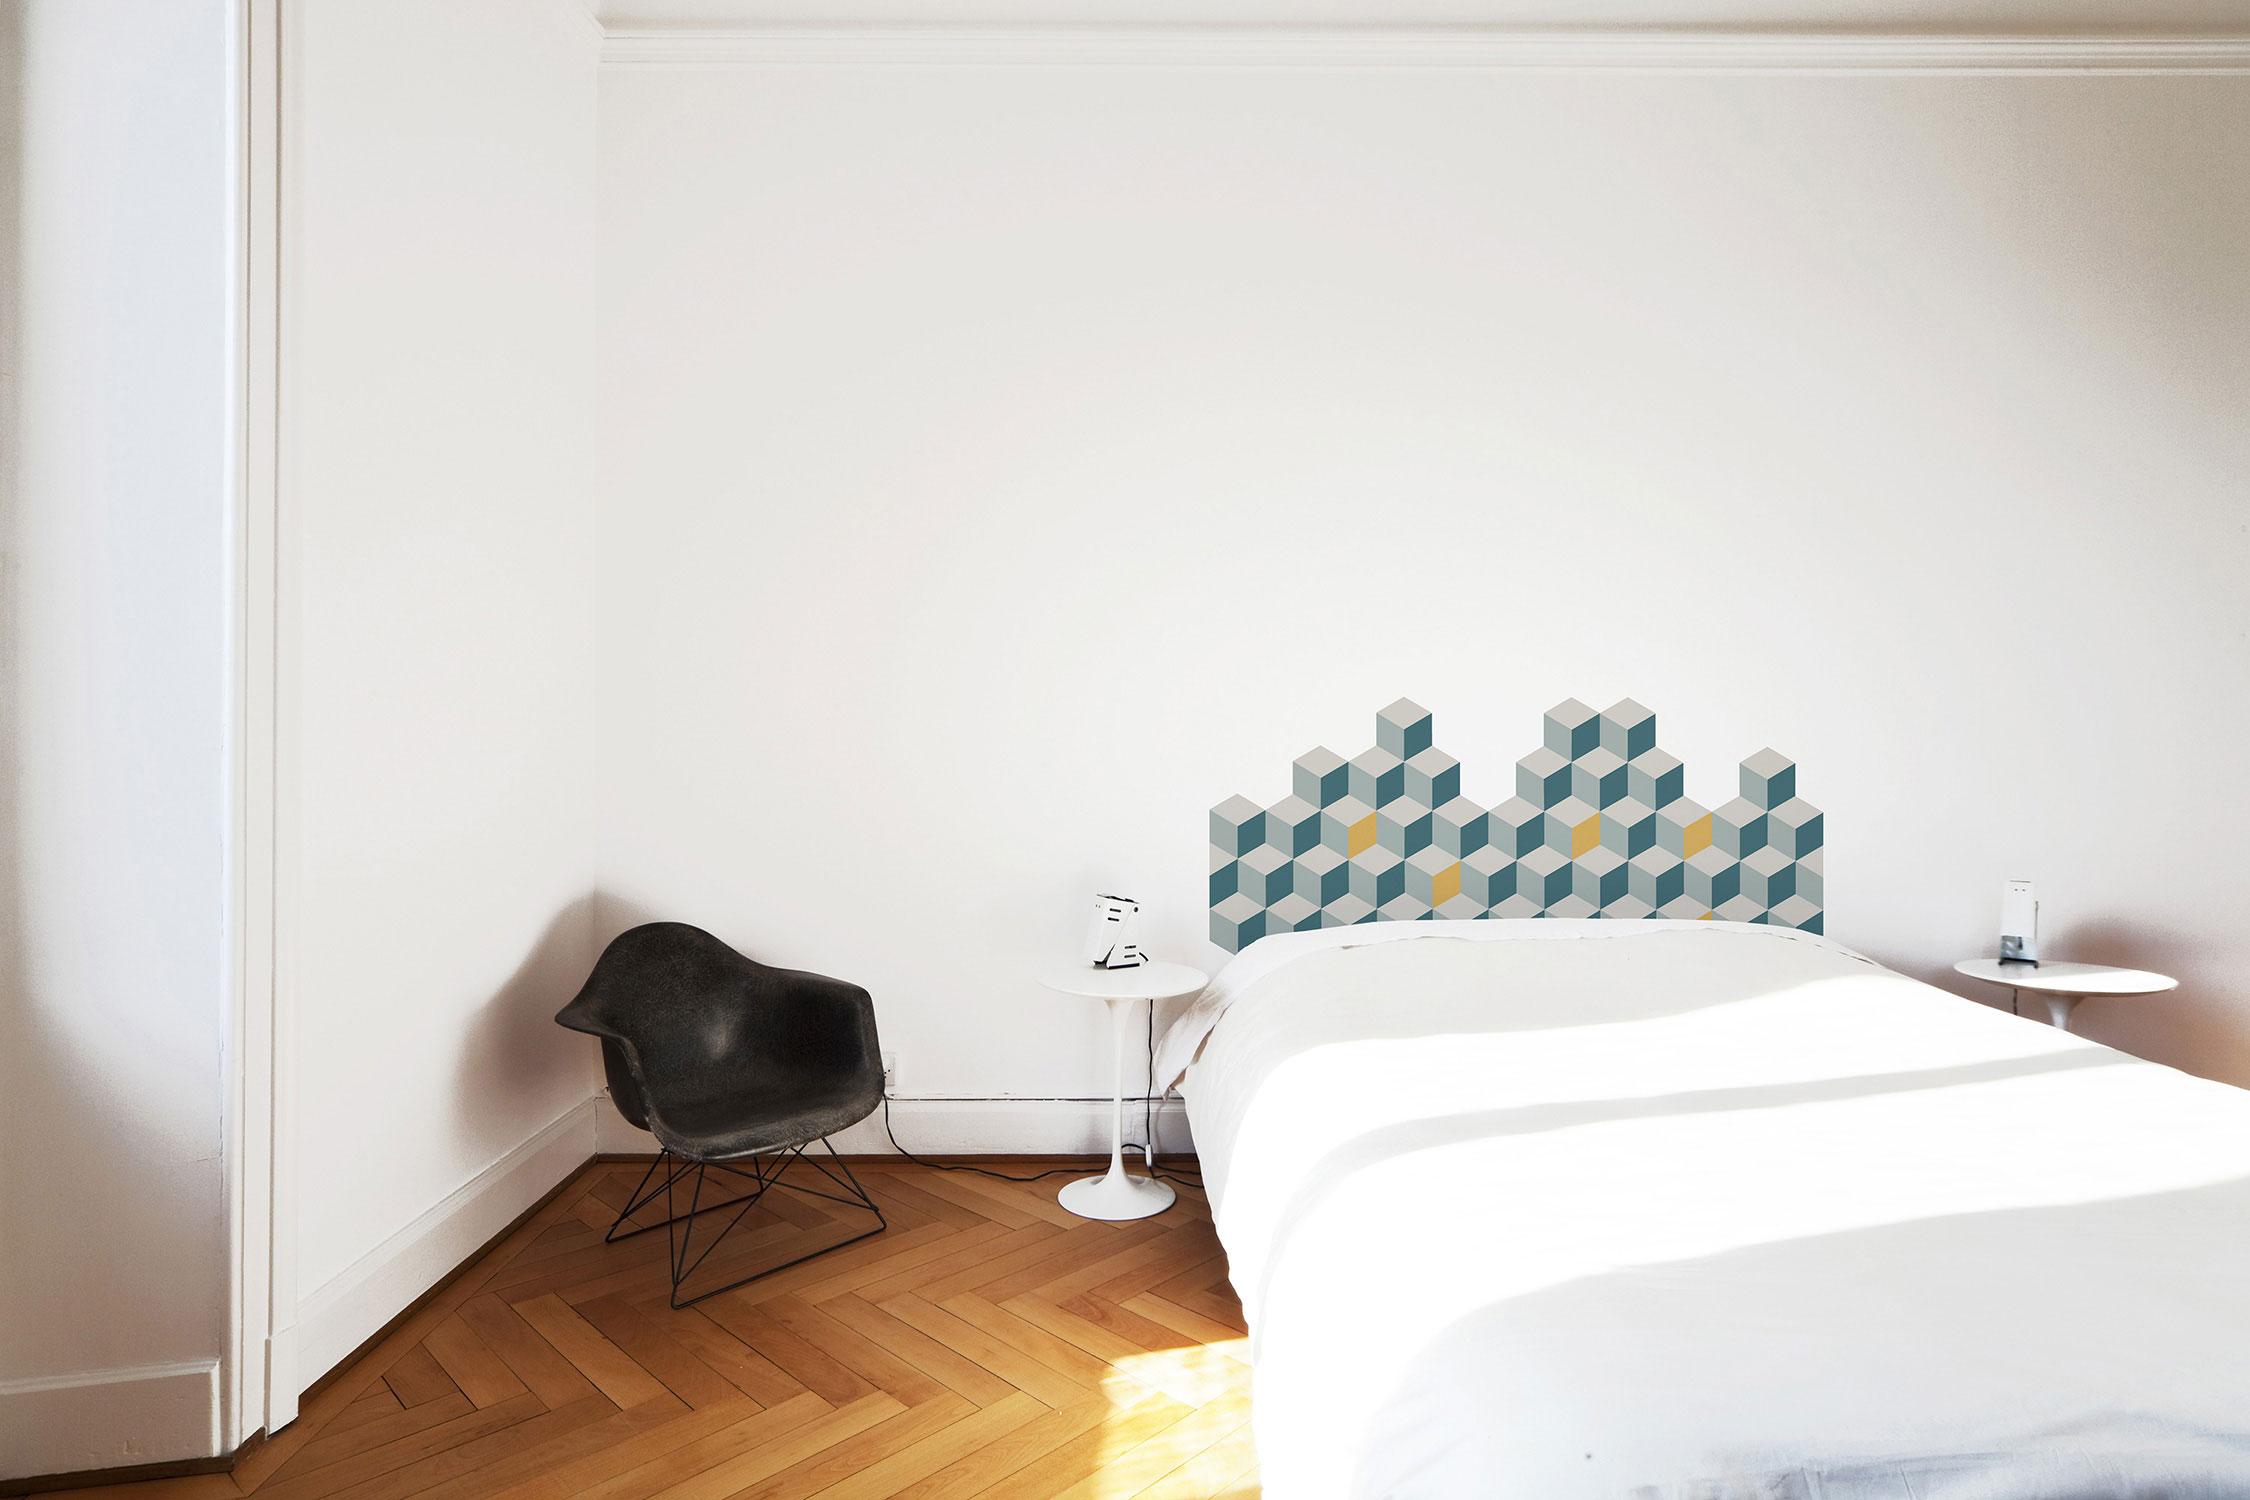 mpgmb_Adzif_Malmo_Turquoise_2013_W_scandinavian_design_vintage_headboards_skandynawski_design_zaglowki_vintage